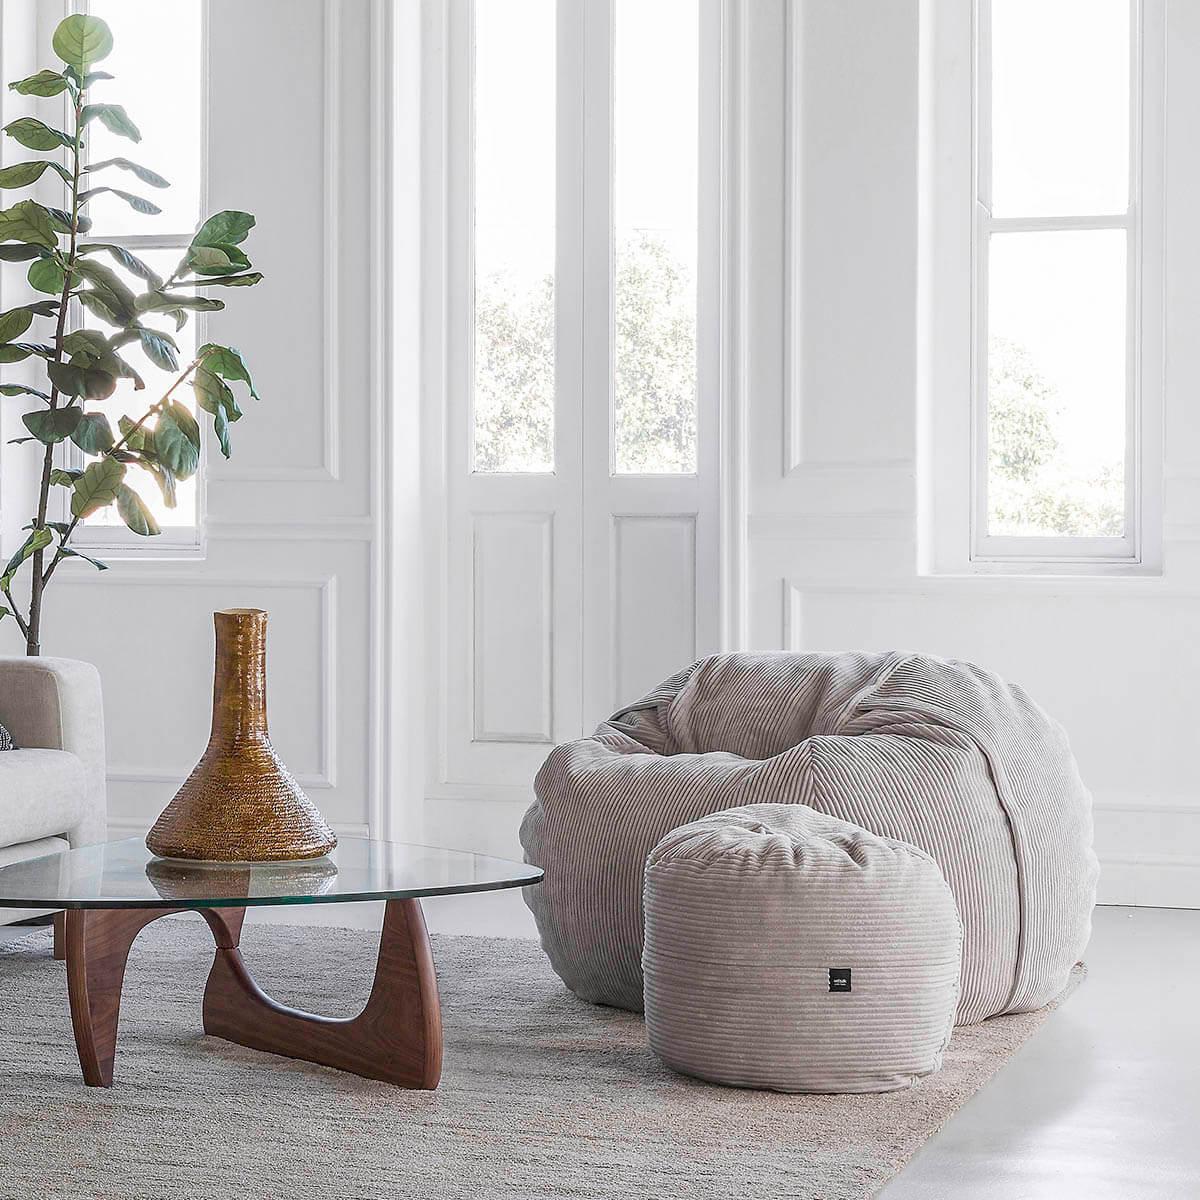 fu hocker cord jetzt online kaufen. Black Bedroom Furniture Sets. Home Design Ideas